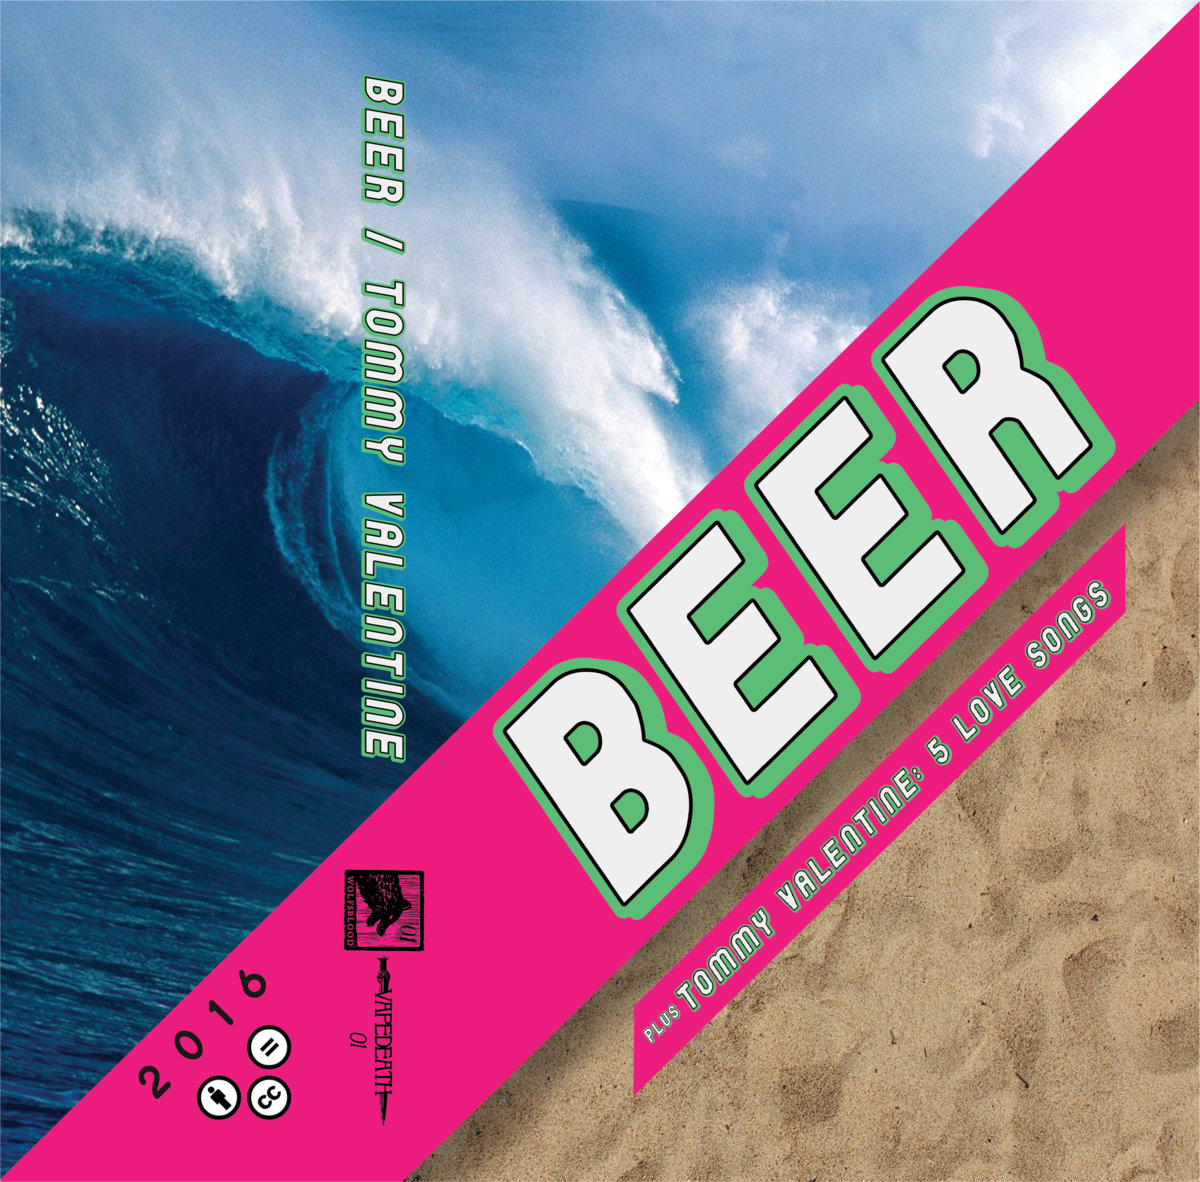 BEER/Tommy Valentine release BEER plus Tommy Valentine: 5 Love Songs